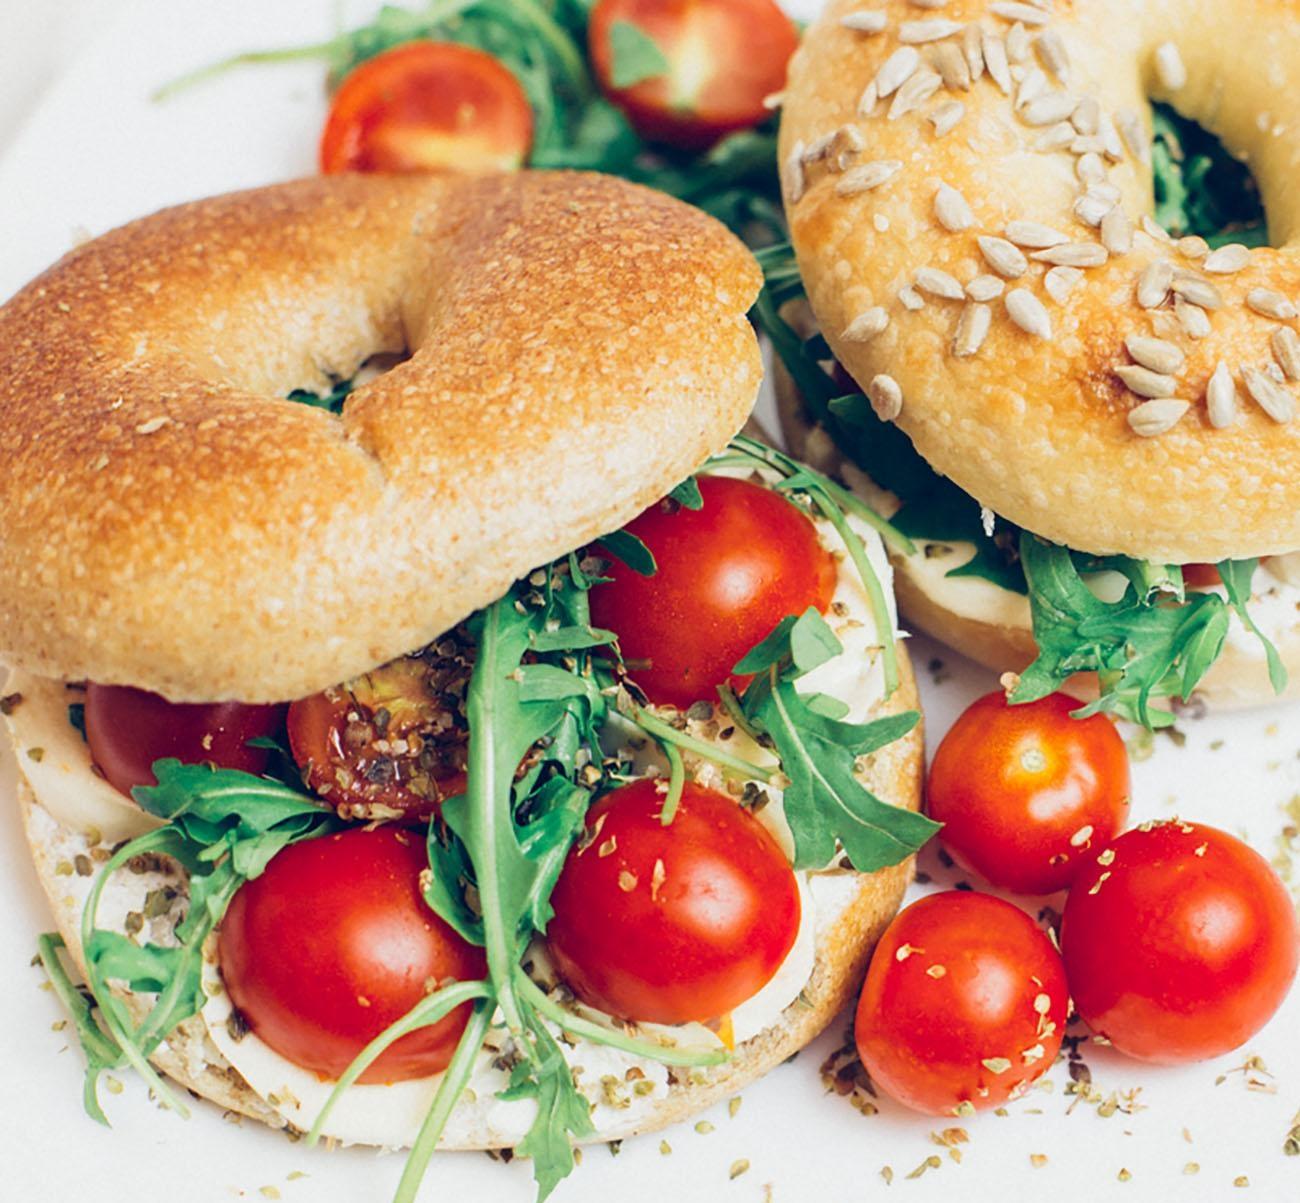 šta jedemo danas 1 Šta jedemo danas: Mediteranski integralni caprese bejgl sendvič i egzotični detox čaj!